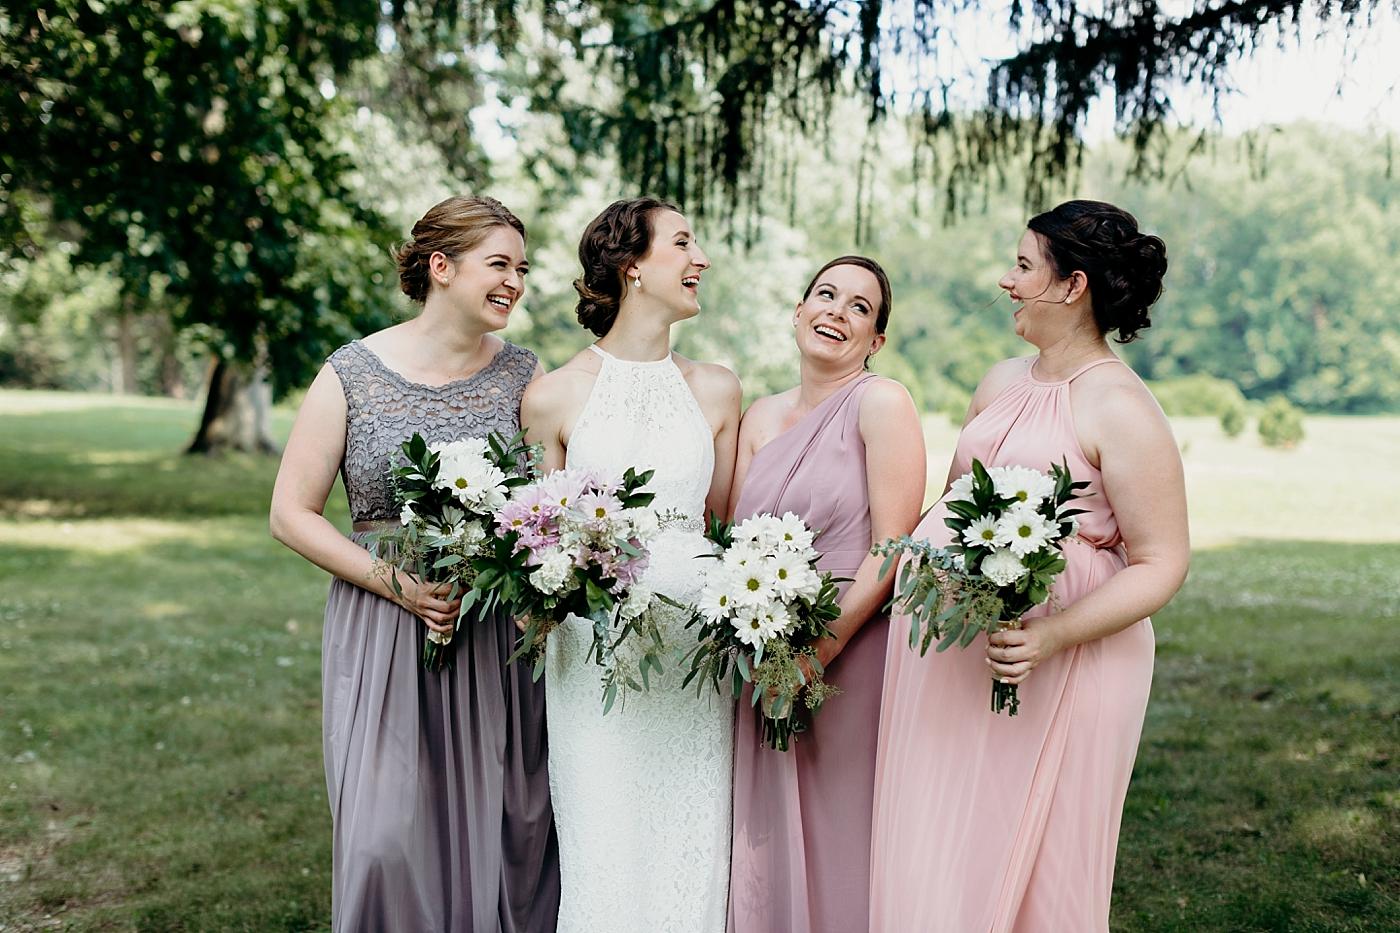 Chateau-Michelle-Wedding-Julia+JuanLuis_TheHeartlandersCo2018LA-134.jpg